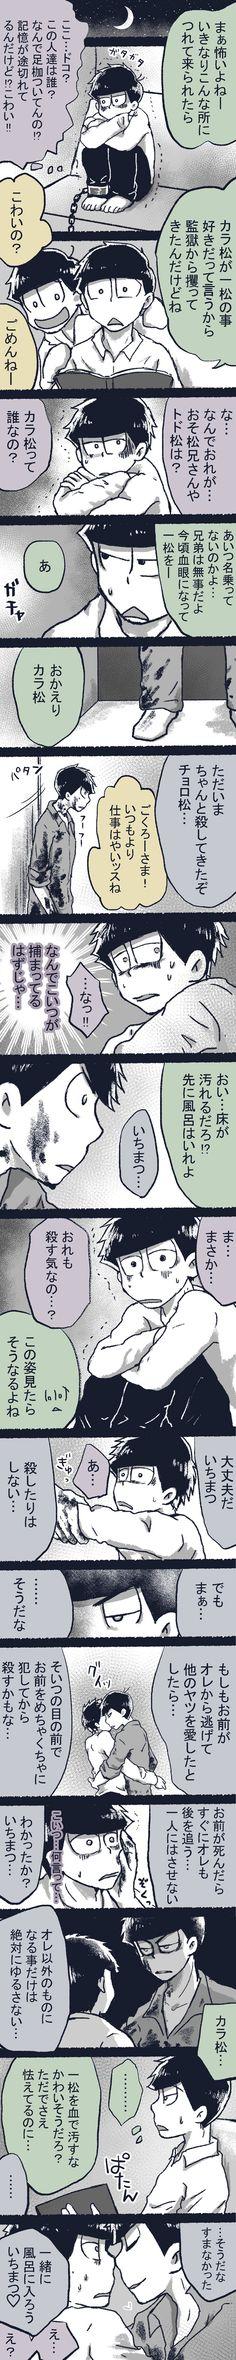 pixiv(ピクシブ)は、作品の投稿・閲覧が楽しめる「イラストコミュニケーションサービス」です。幅広いジャンルの作品が投稿され、ユーザー発の企画やメーカー公認のコンテストが開催されています。 Osomatsu San Doujinshi, Ichimatsu, Homestuck, Hetalia, Fantasy, Anime, Pictures, Pixiv, Feels